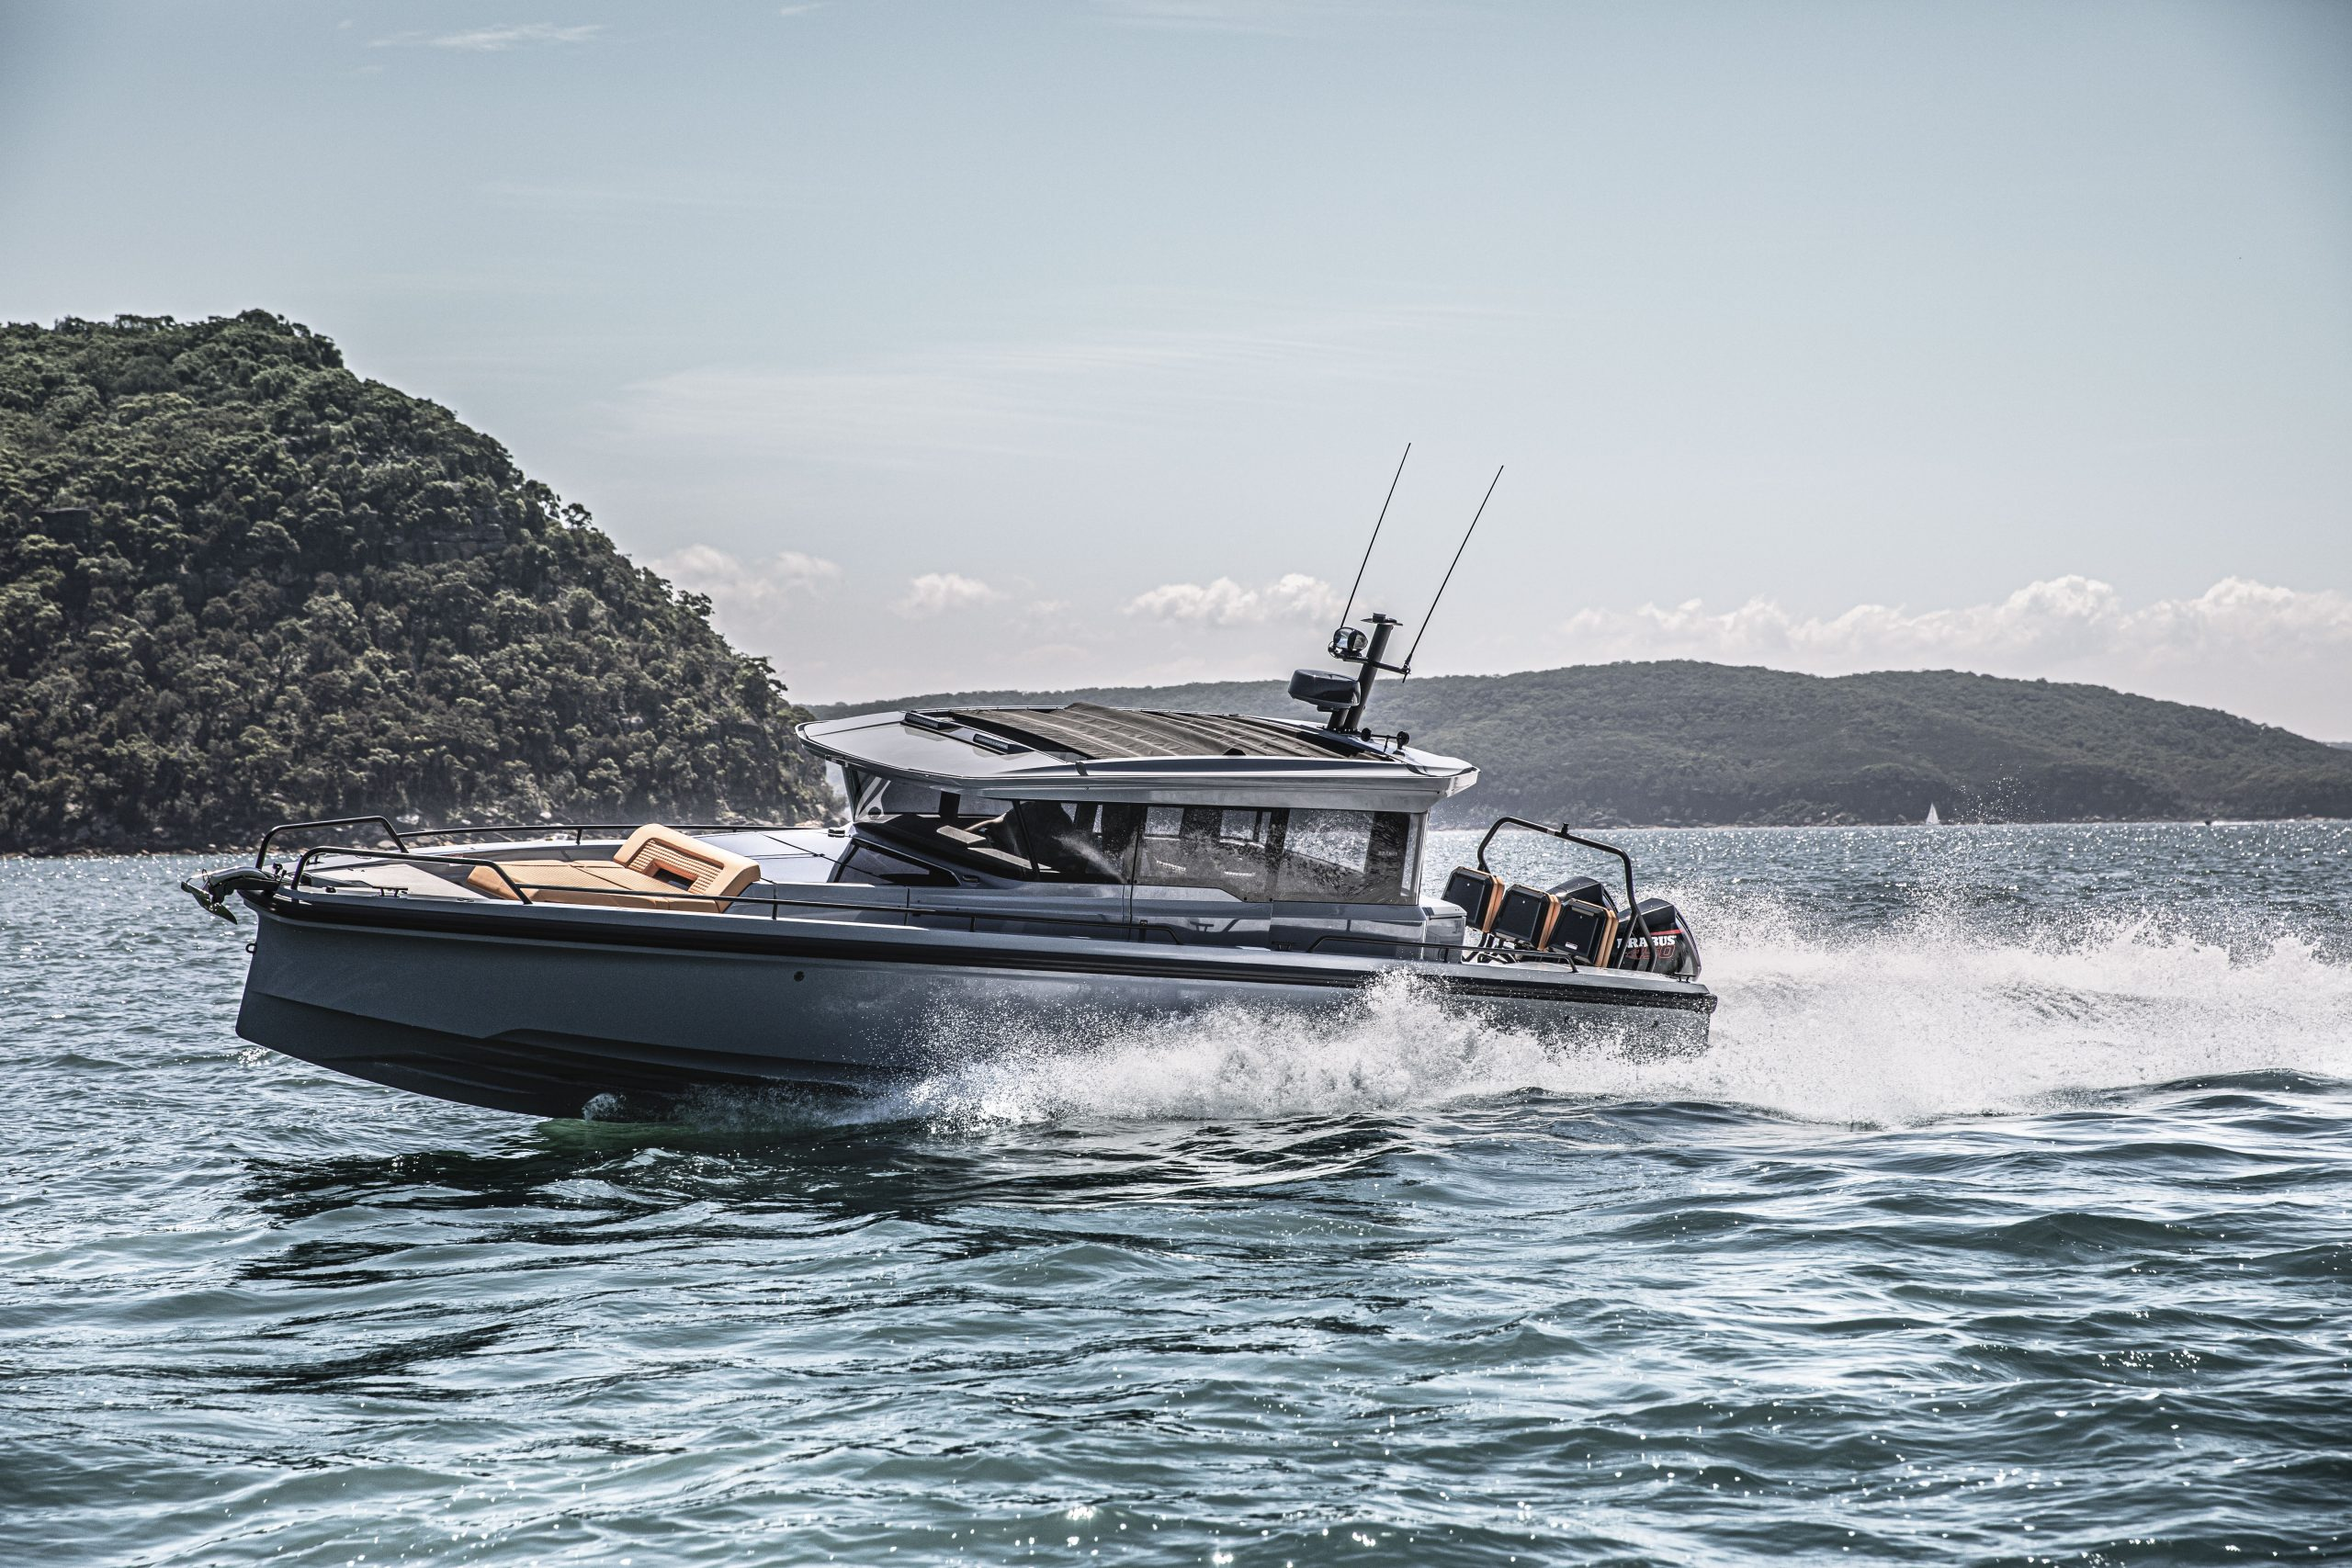 BRABUS Shadow 900 XC Australia Eyachts